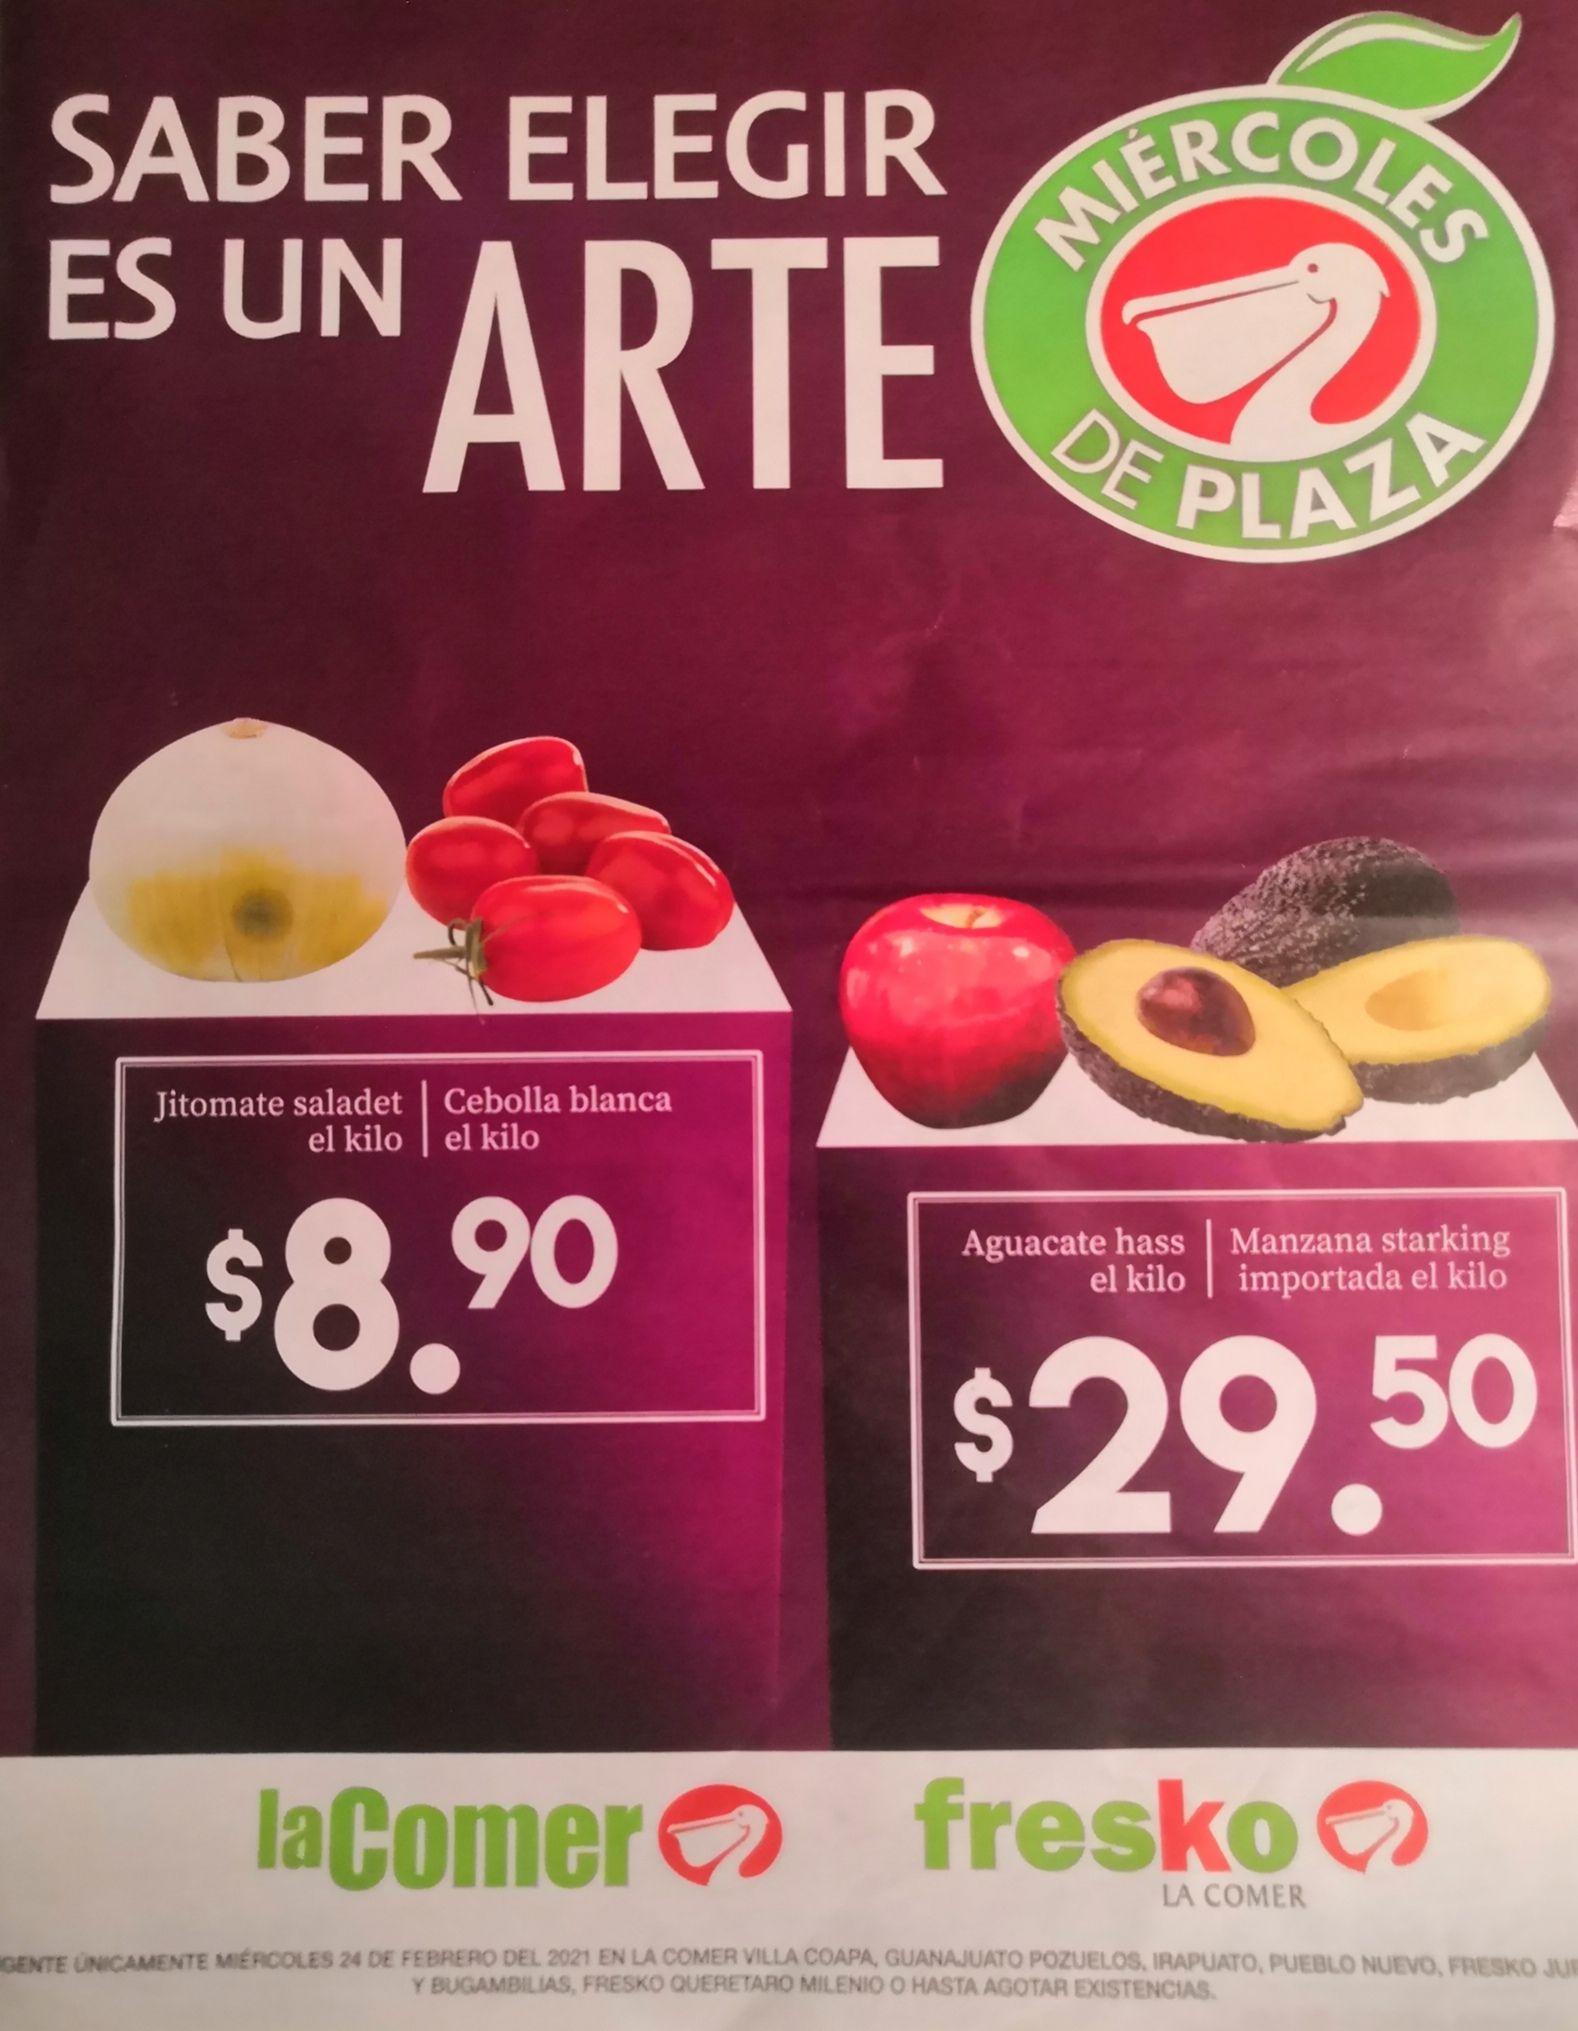 La Comer y Fresko: Miércoles de Plaza 24 Febrero: Jitomate ó Cebolla $8.90 kg... Aguacate ó Manzana Starking $29.50 kg.